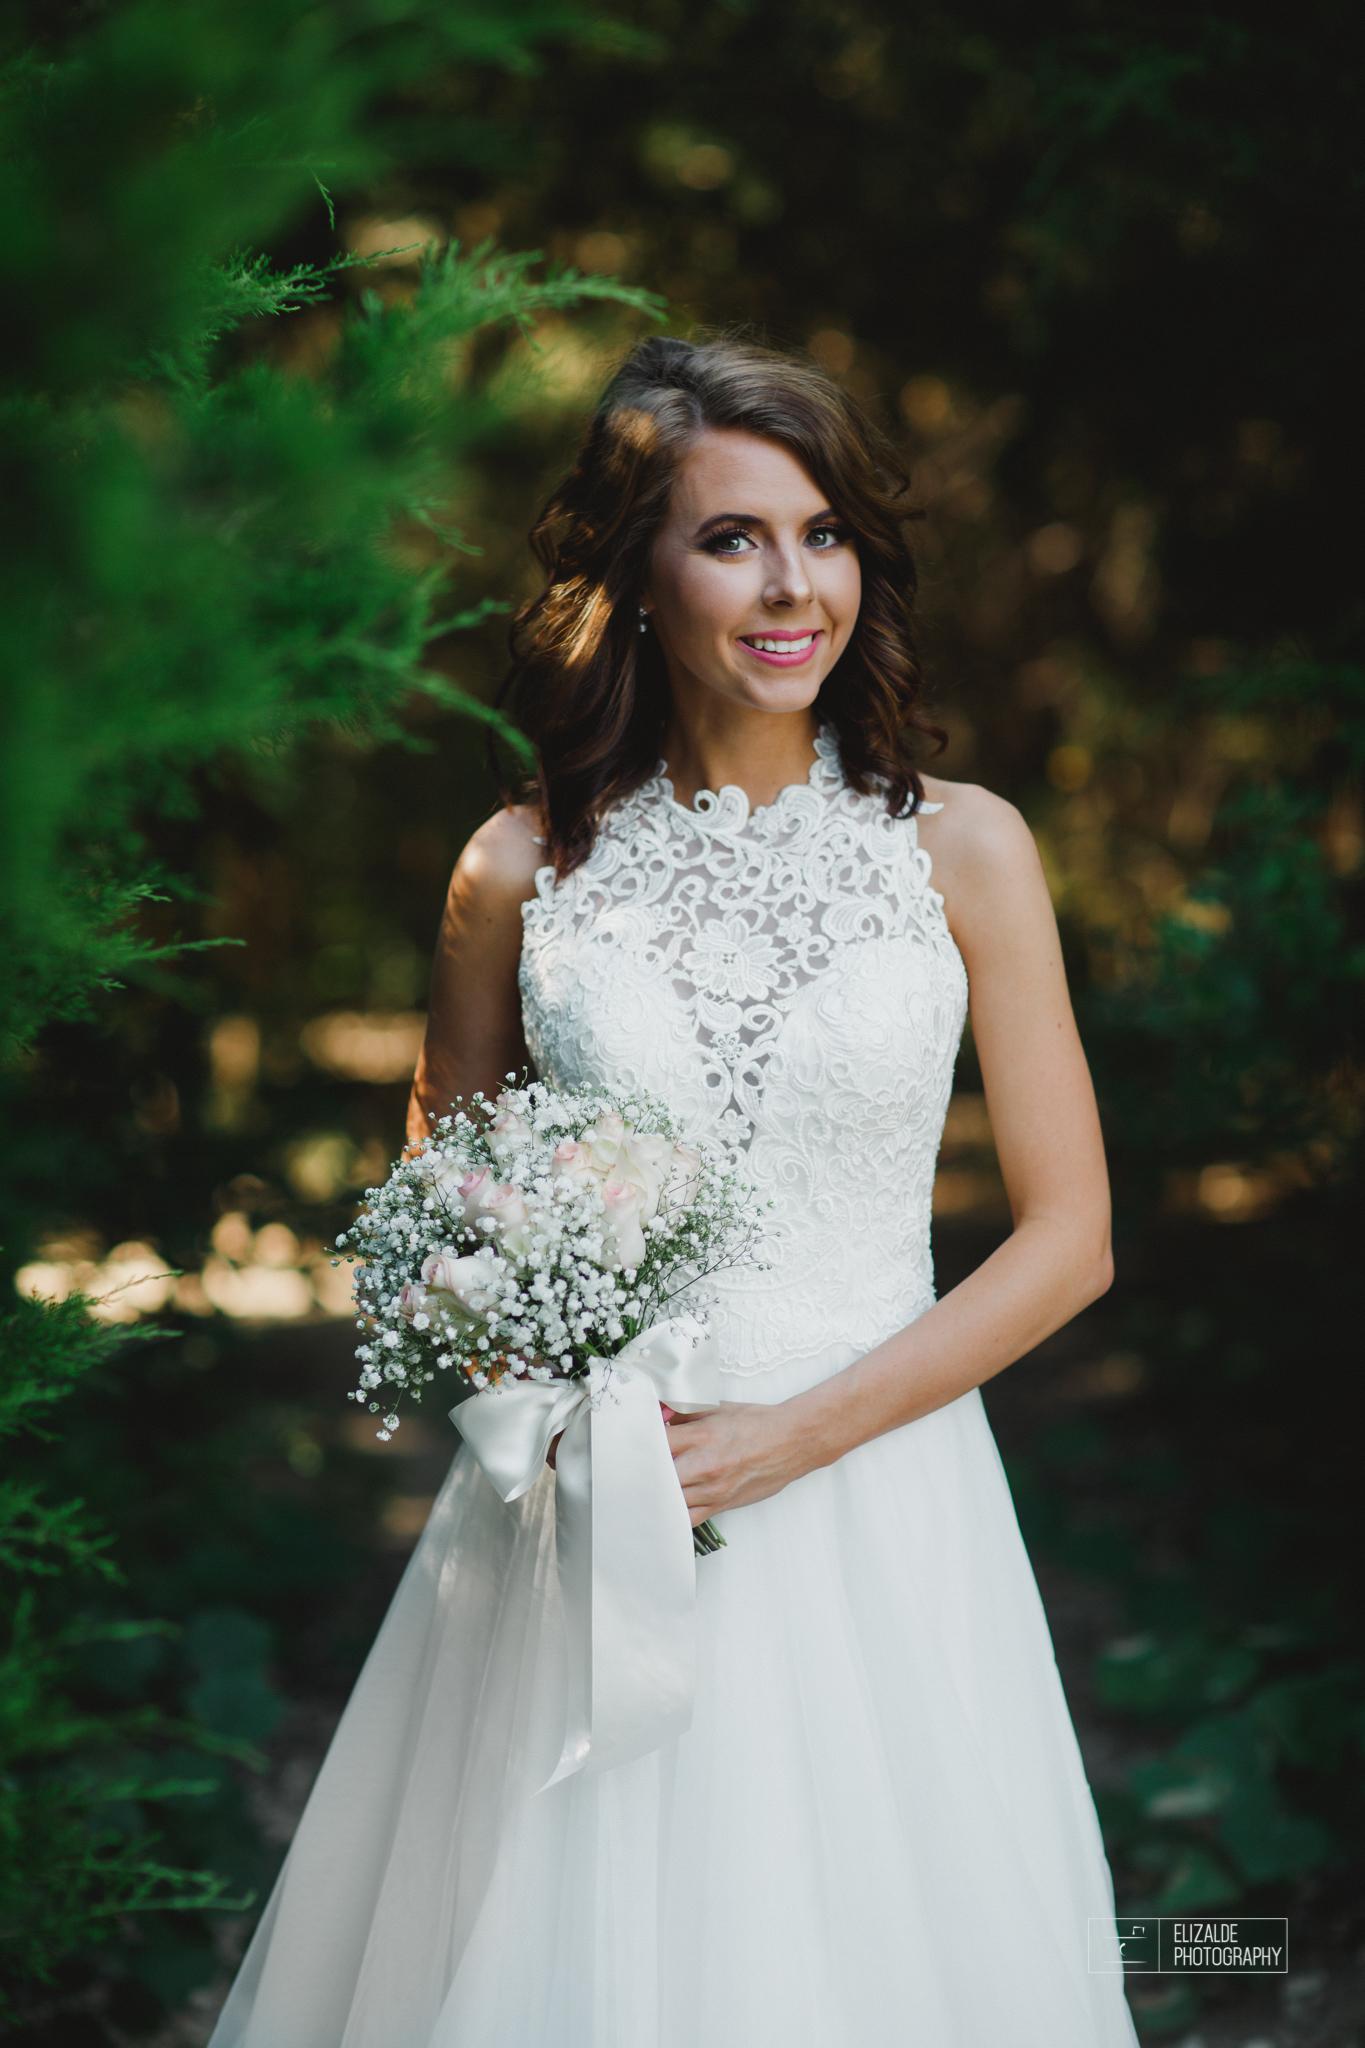 Bridal session_Dallas Photographer_Elizalde Photography_Denton photographer_ DFW Photographer_ Wedding Photographer_Baleigh1.jpg